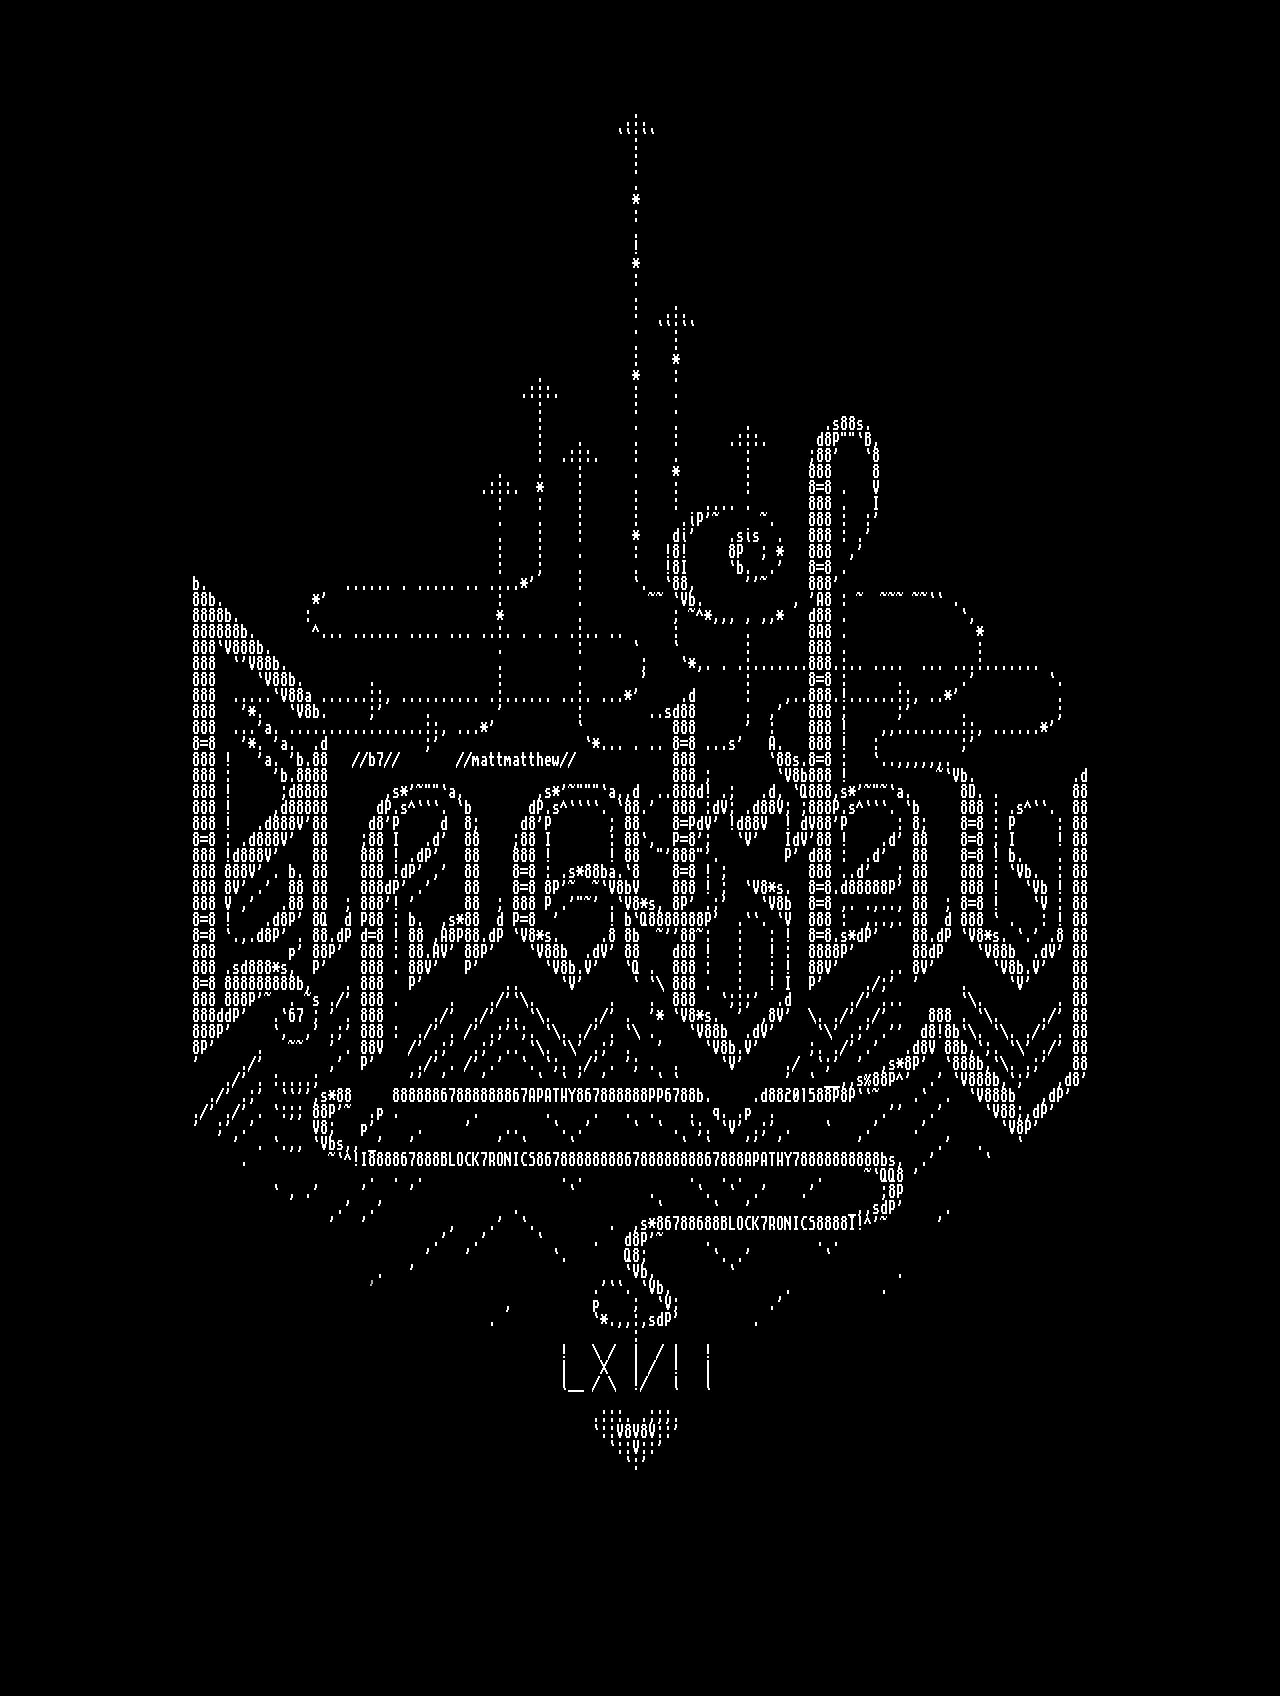 2m-apathy.xb